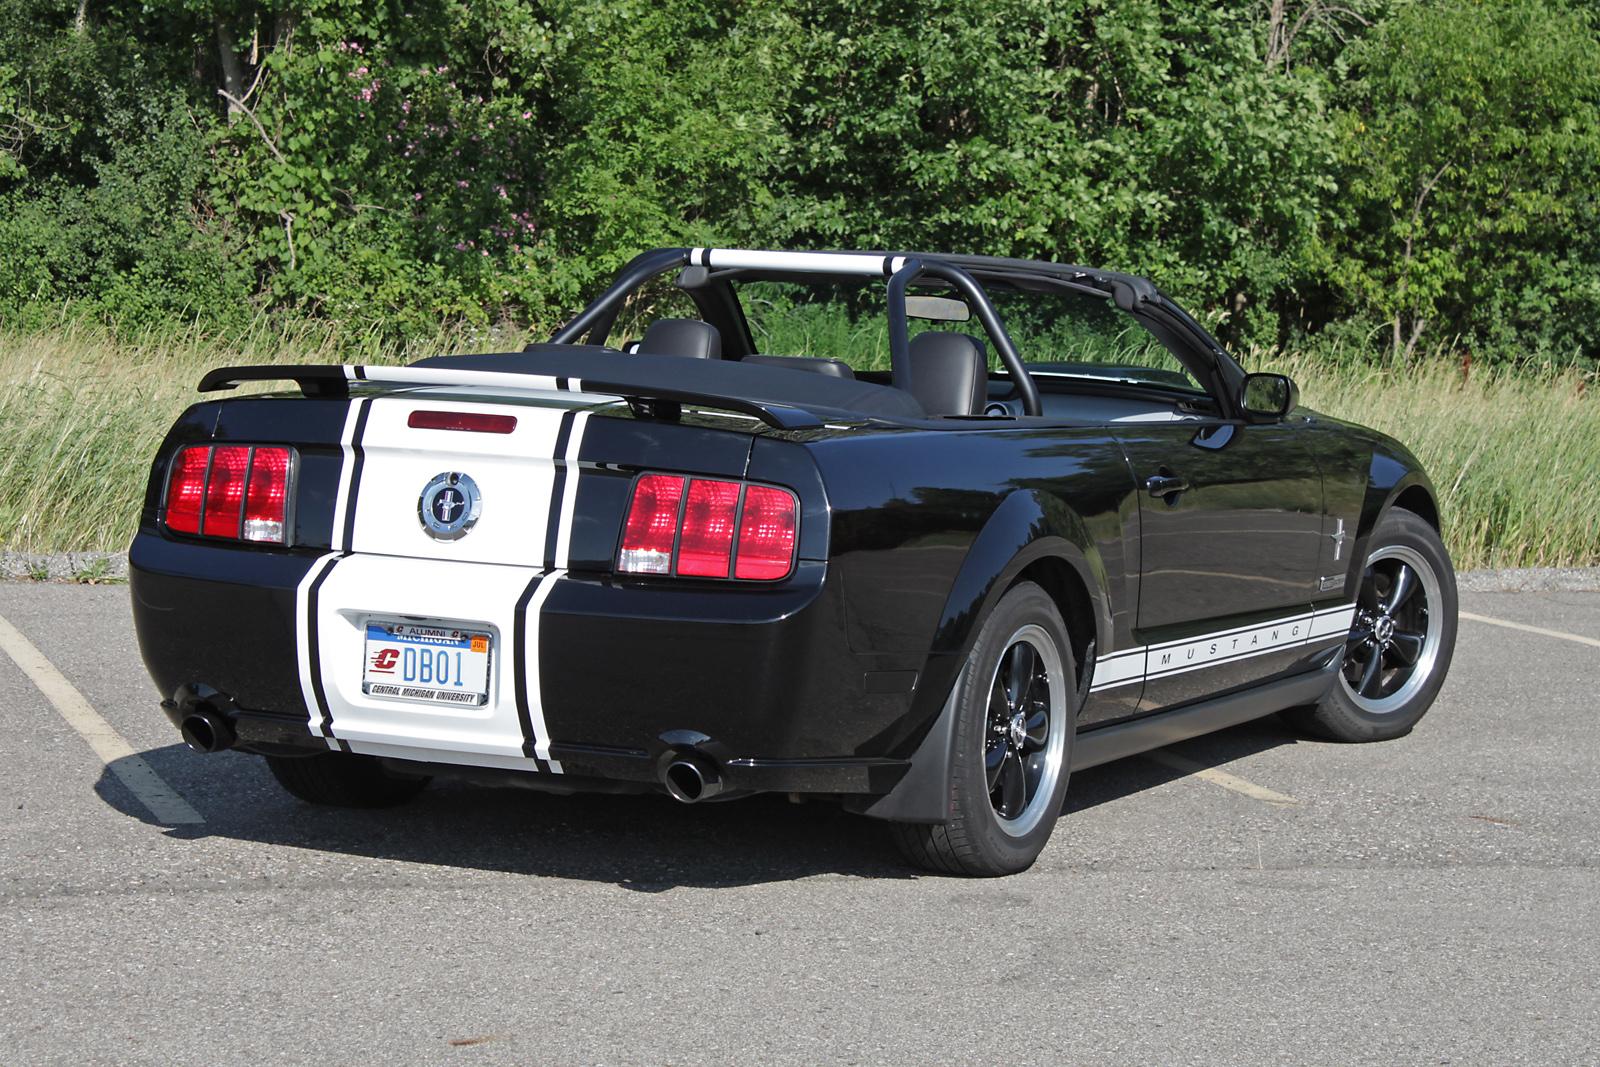 Click image for larger version  Name:Jim Carolan Mustang 7a.jpg Views:76 Size:1.07 MB ID:35811